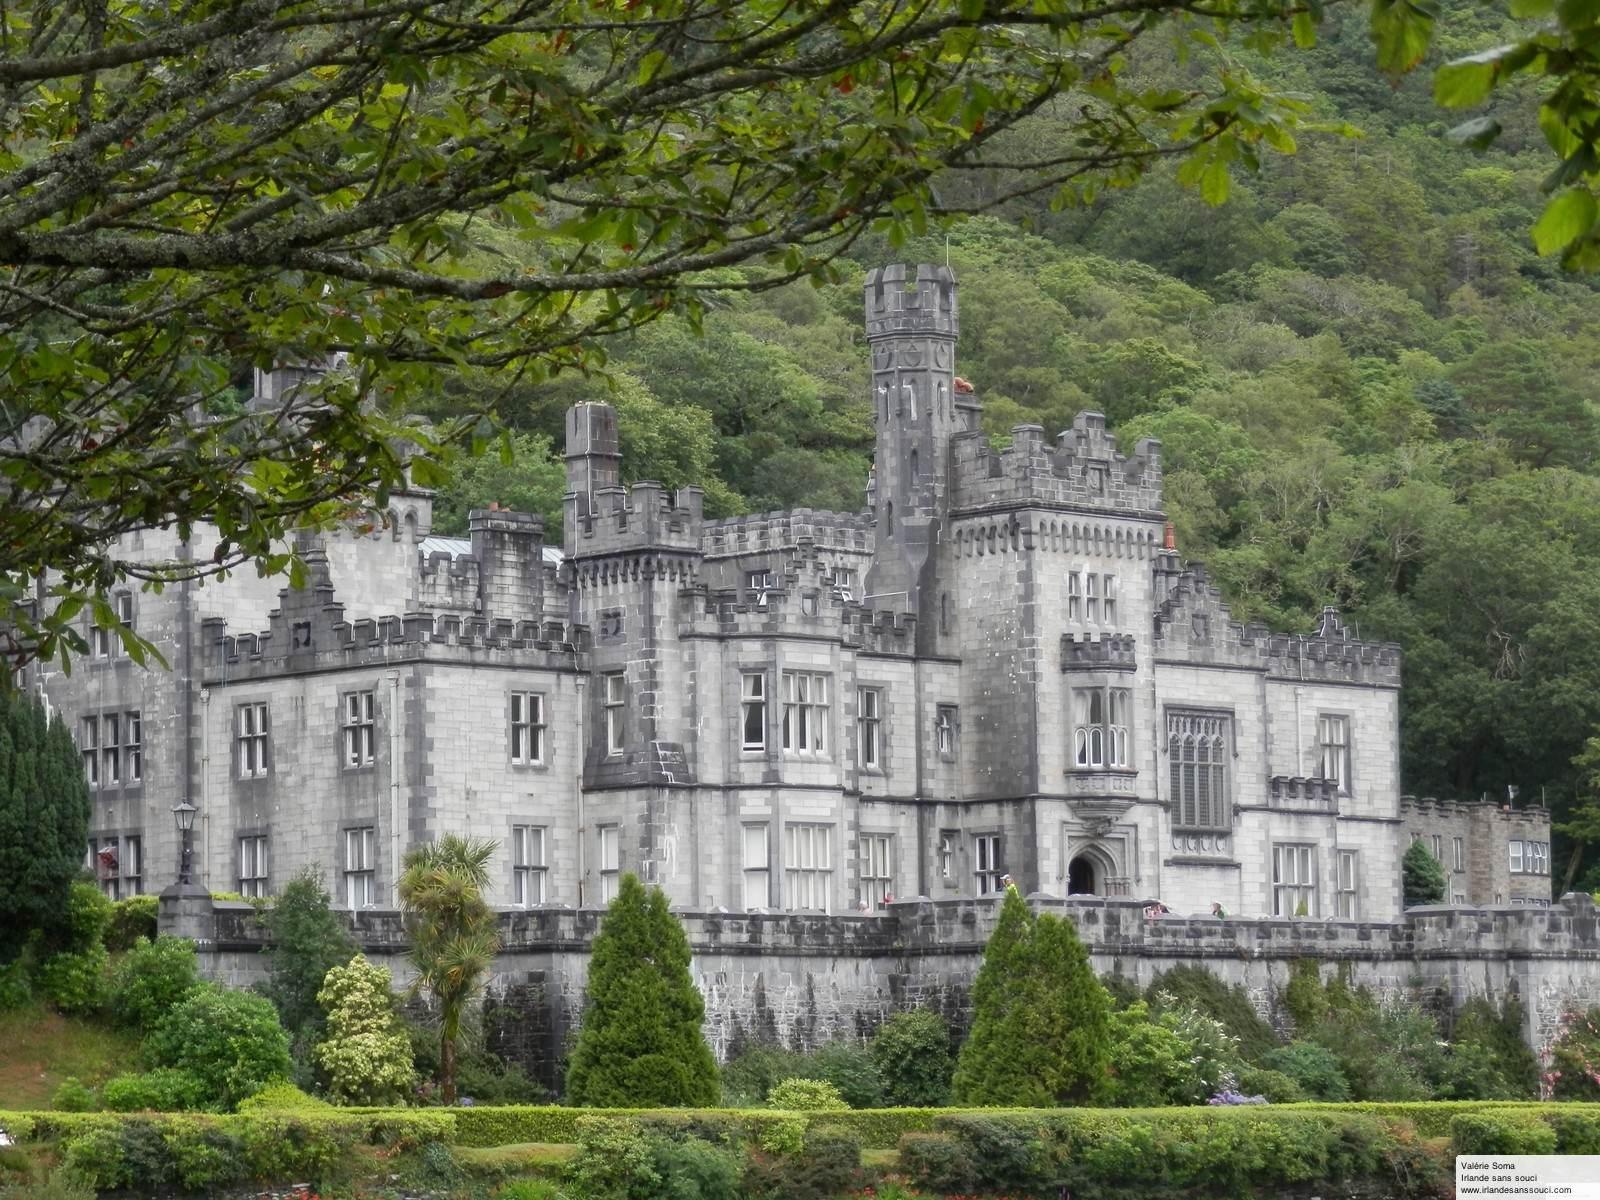 Le voyage organis en irlande caract ristiques communes for Voyage organise jardins anglais